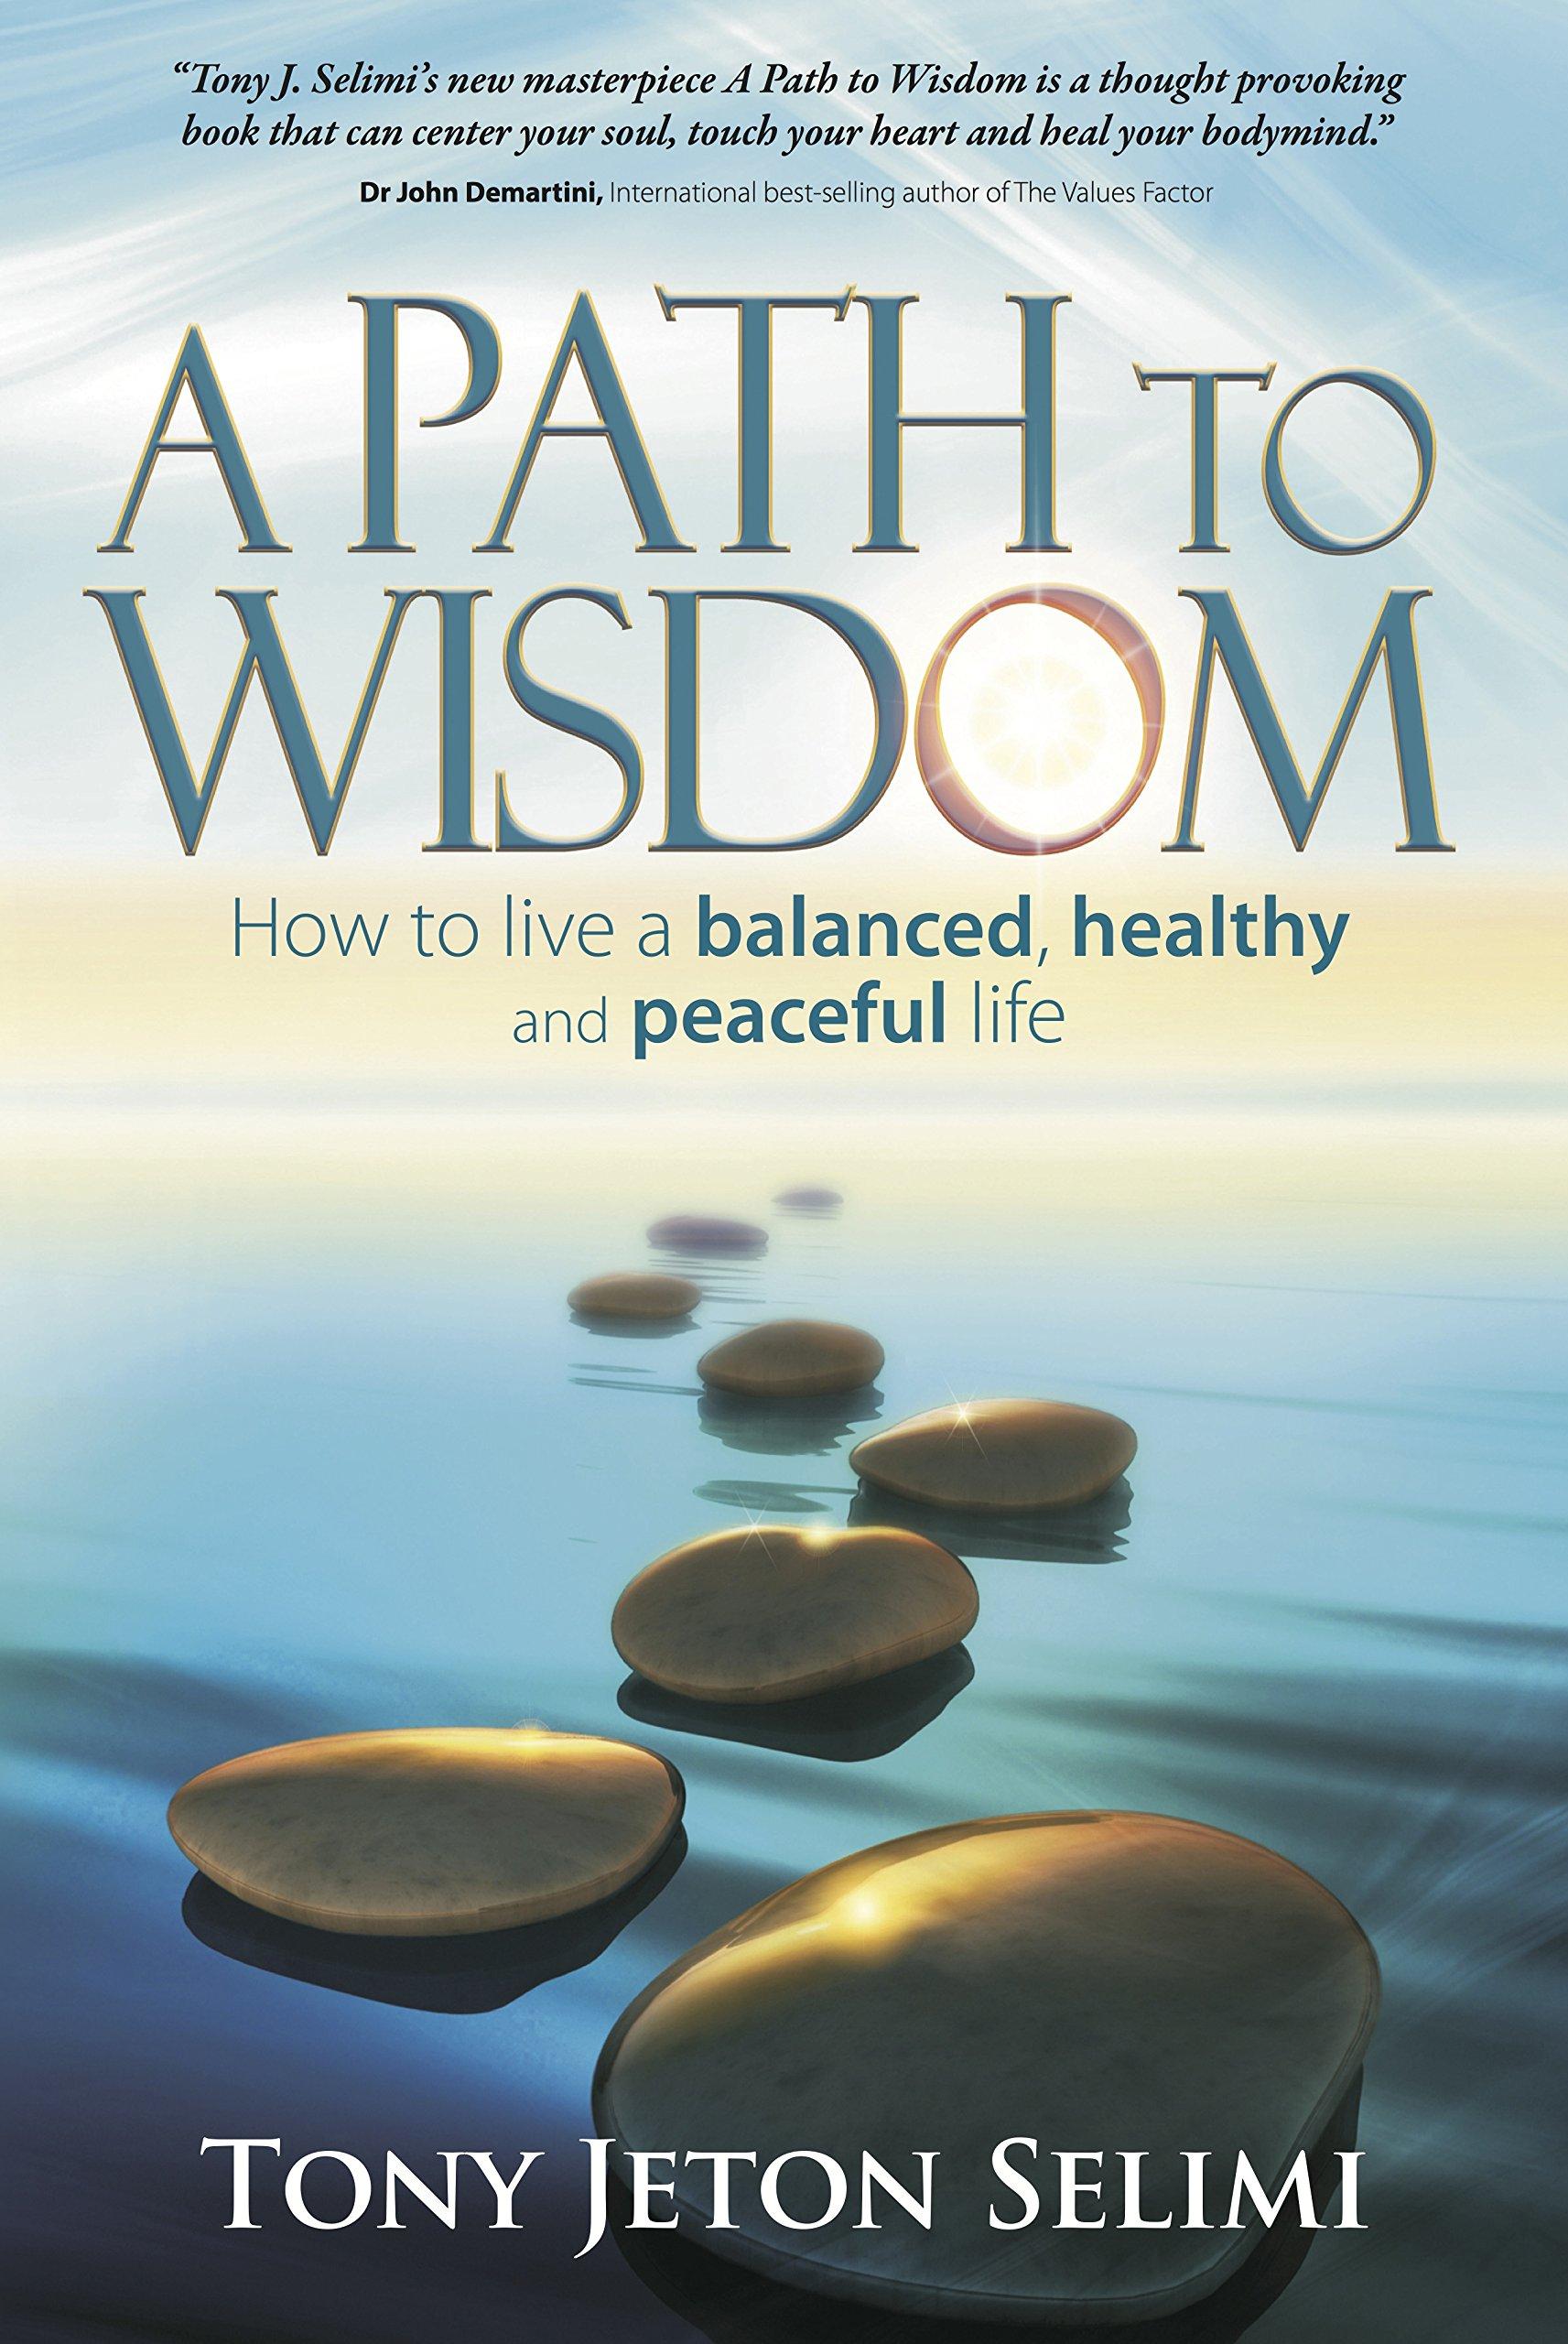 Follow the Author. Tony Jeton Selimi